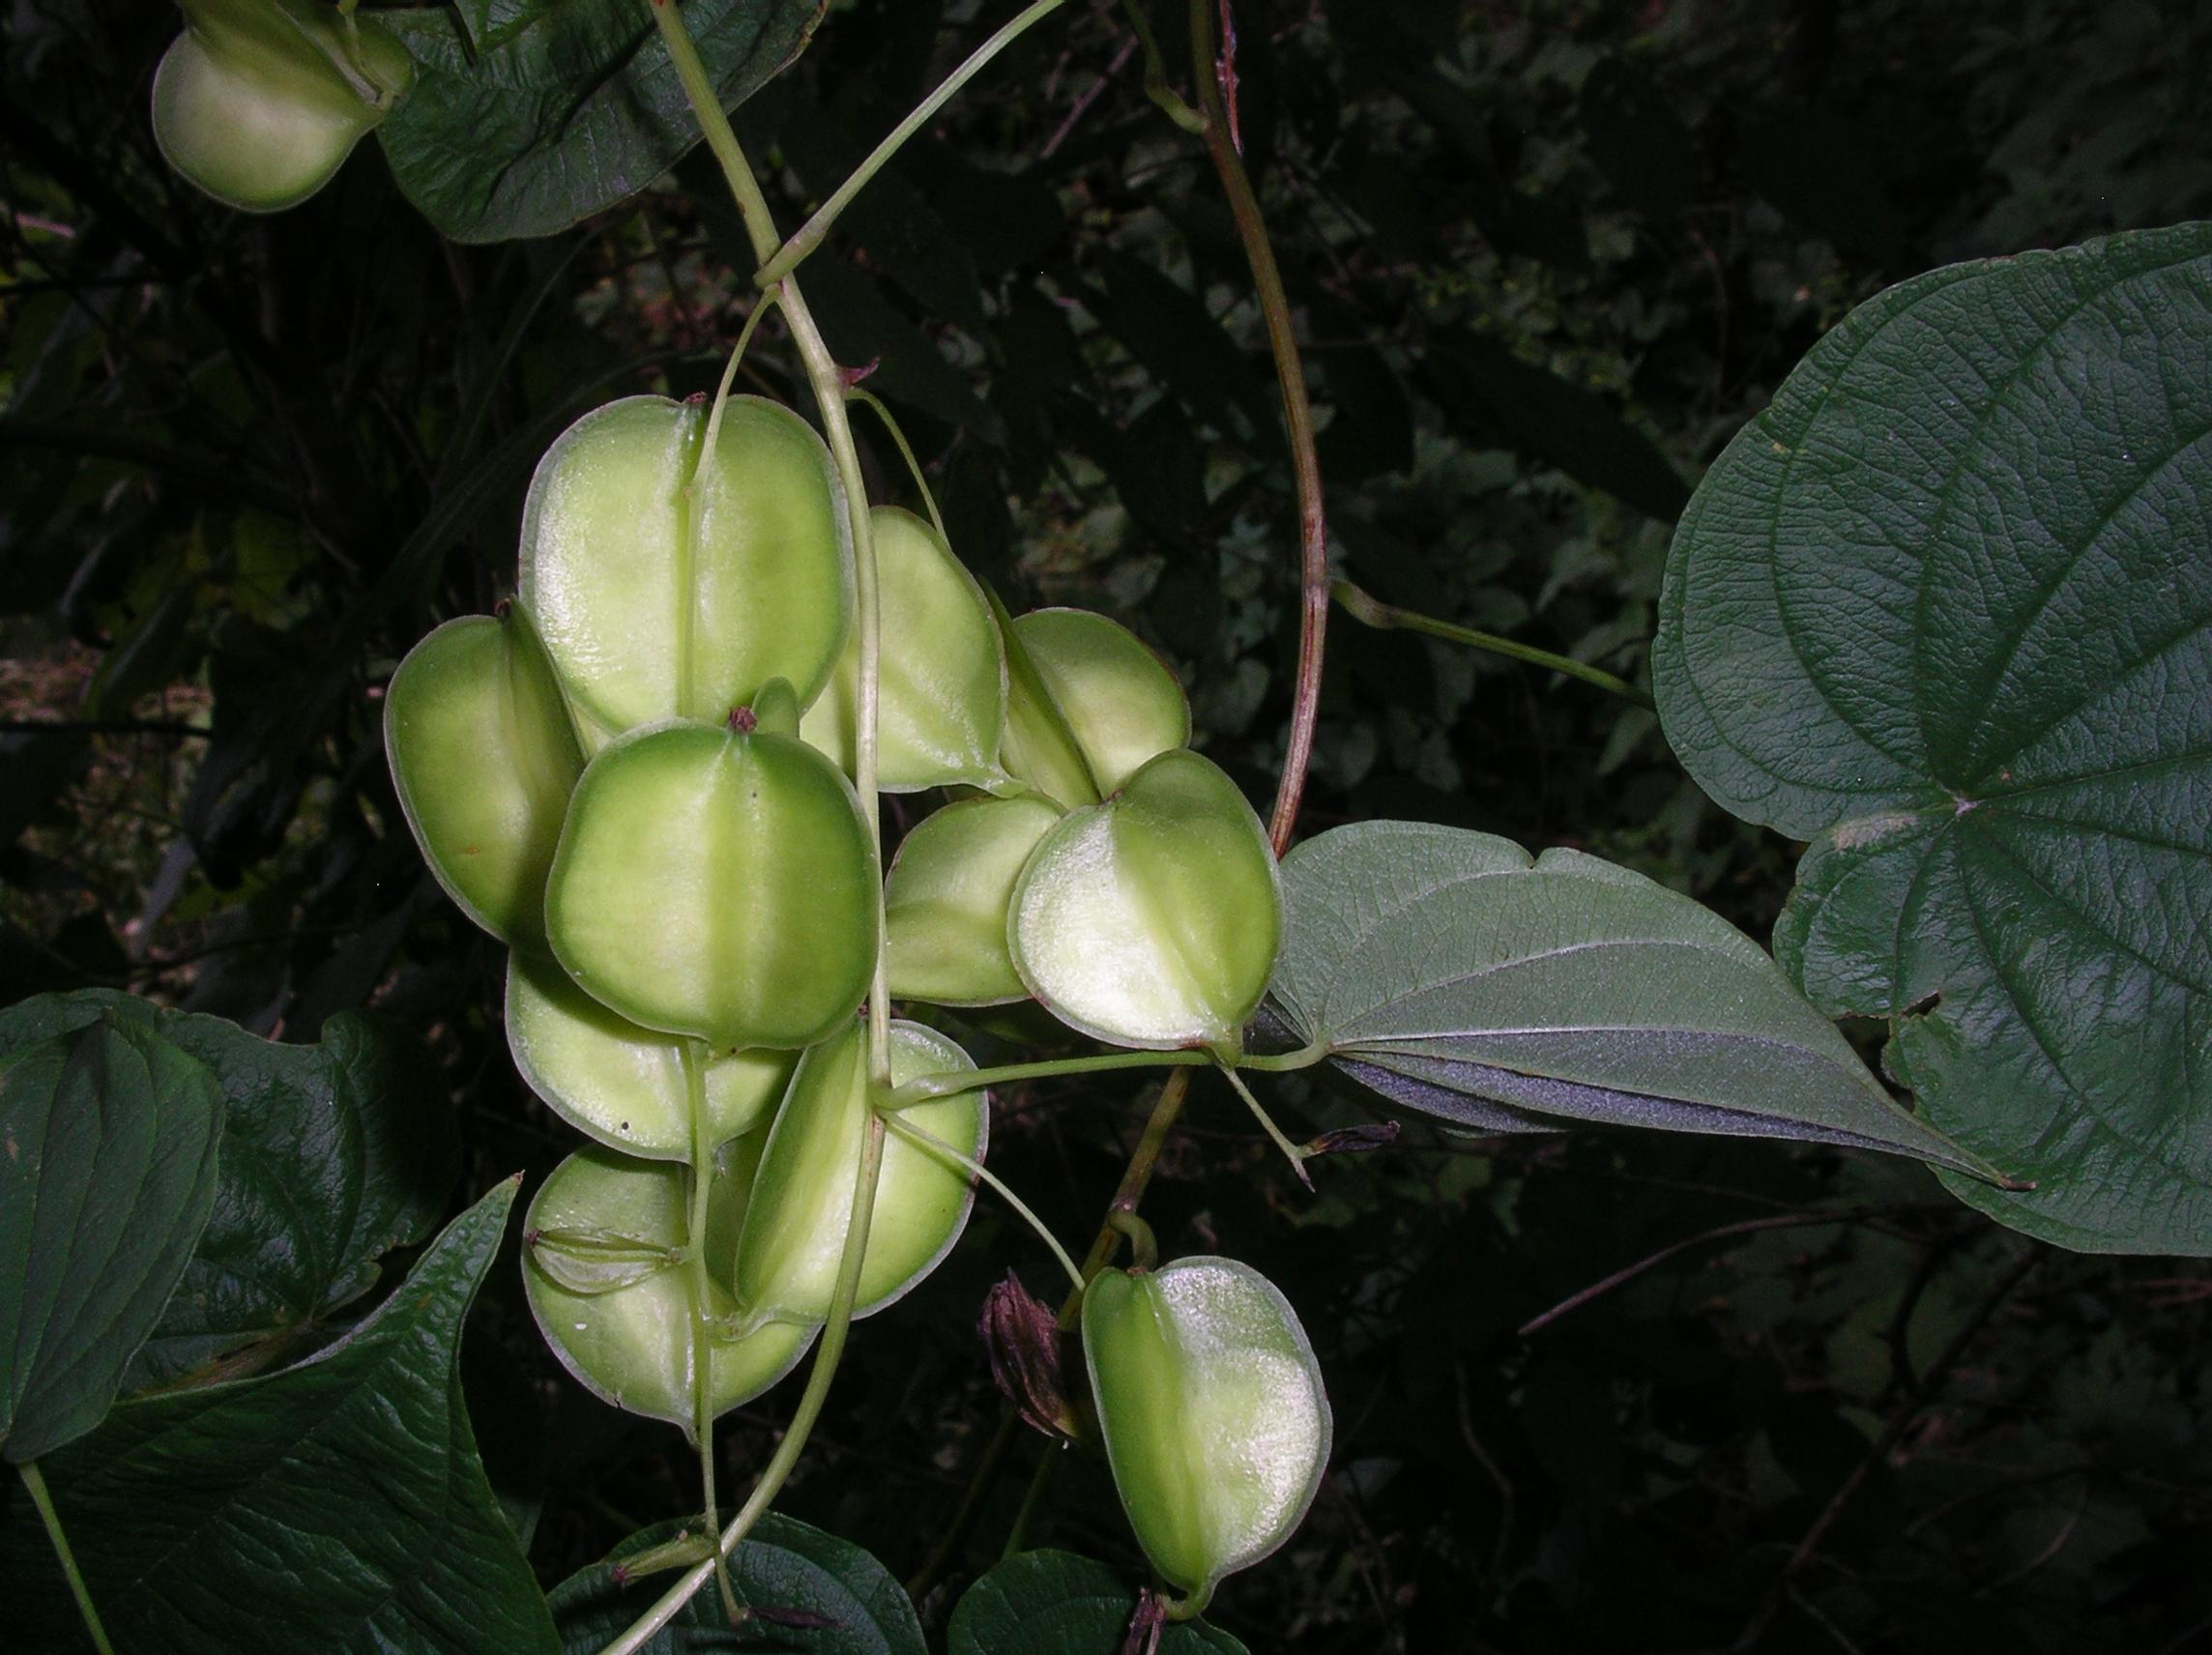 Dioscorea villosa FR IsLkRd